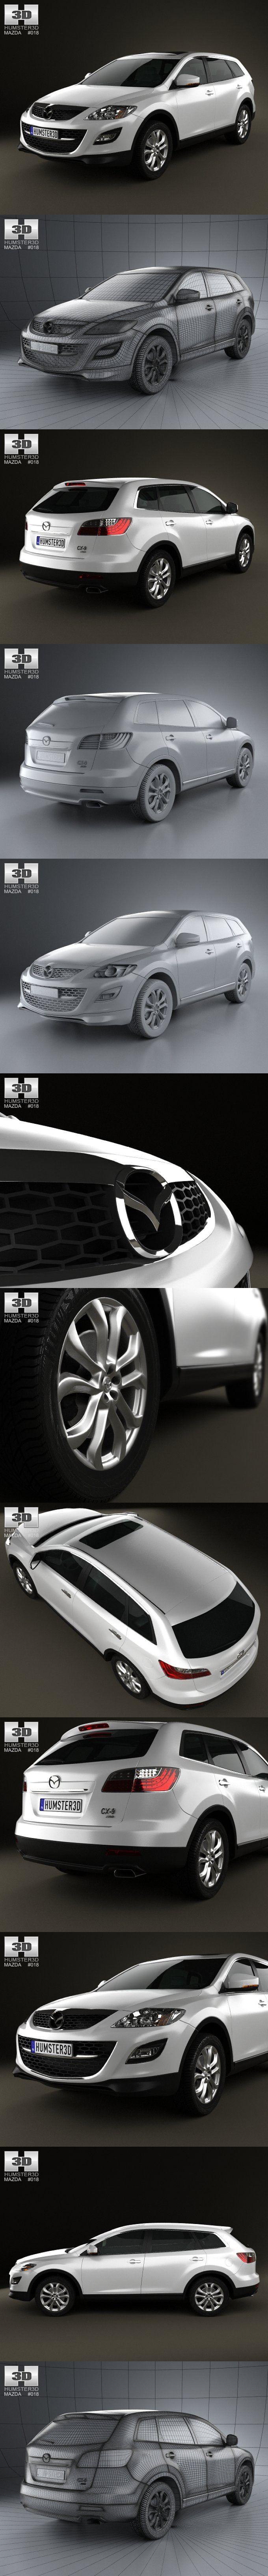 Mazda CX-9 2012. 3D Vehicles